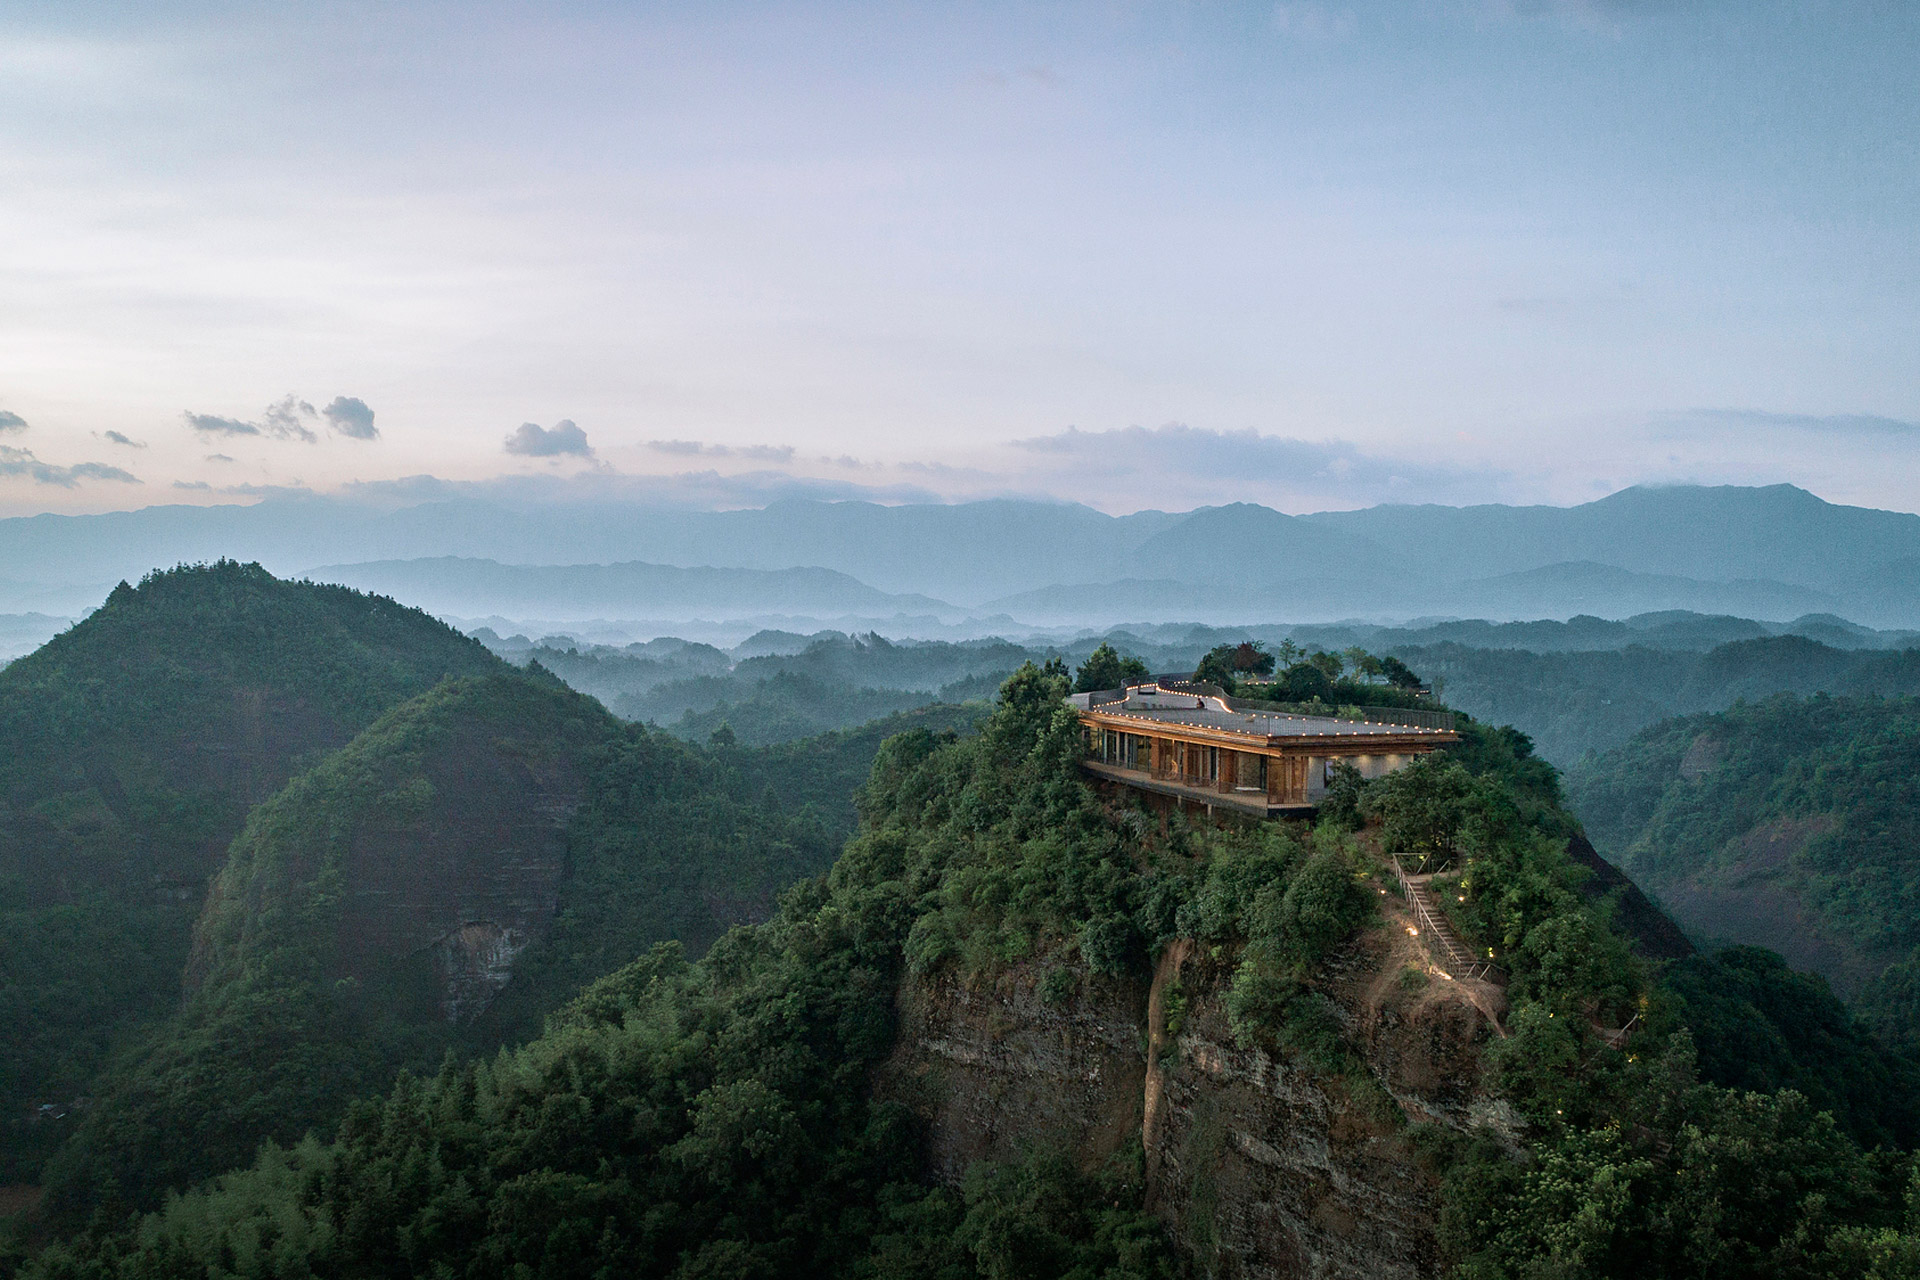 Pingjiang Homey Wild Luxury Hotel